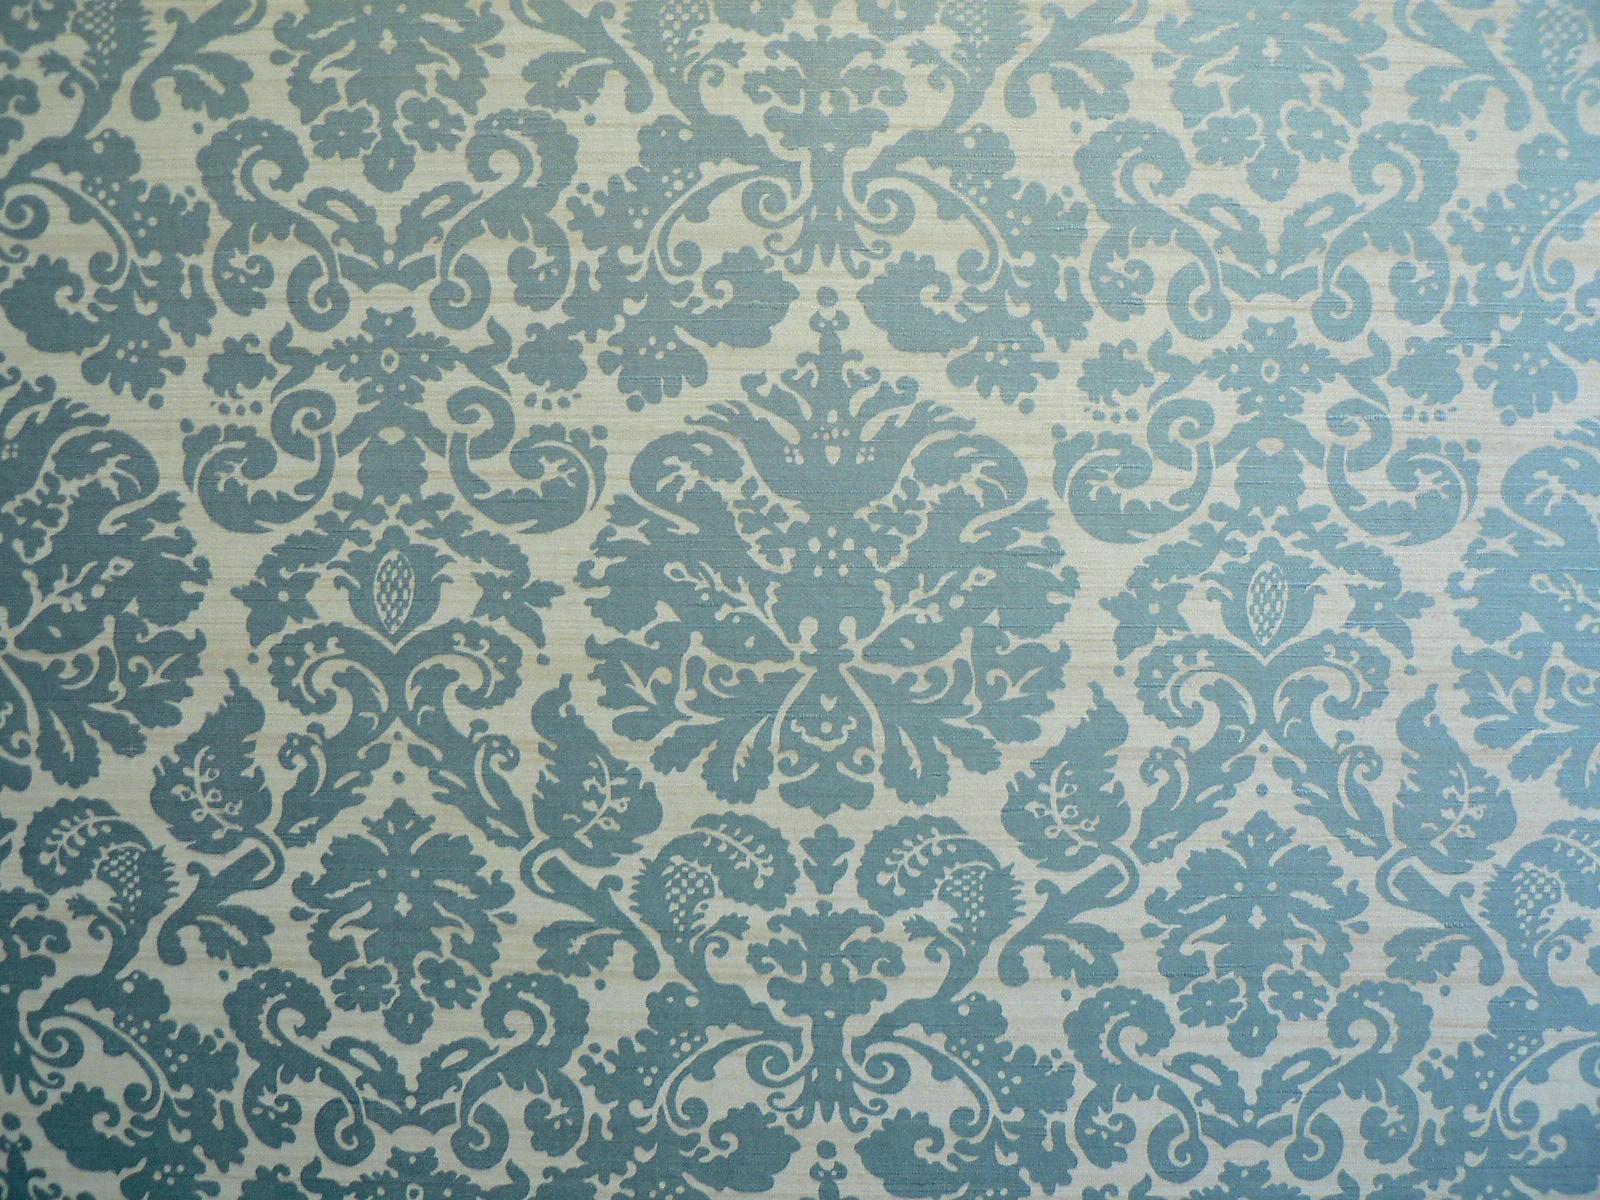 Pattern Vintage Wallpaper 1600x1200 Pattern Vintage Patterns 1600x1200